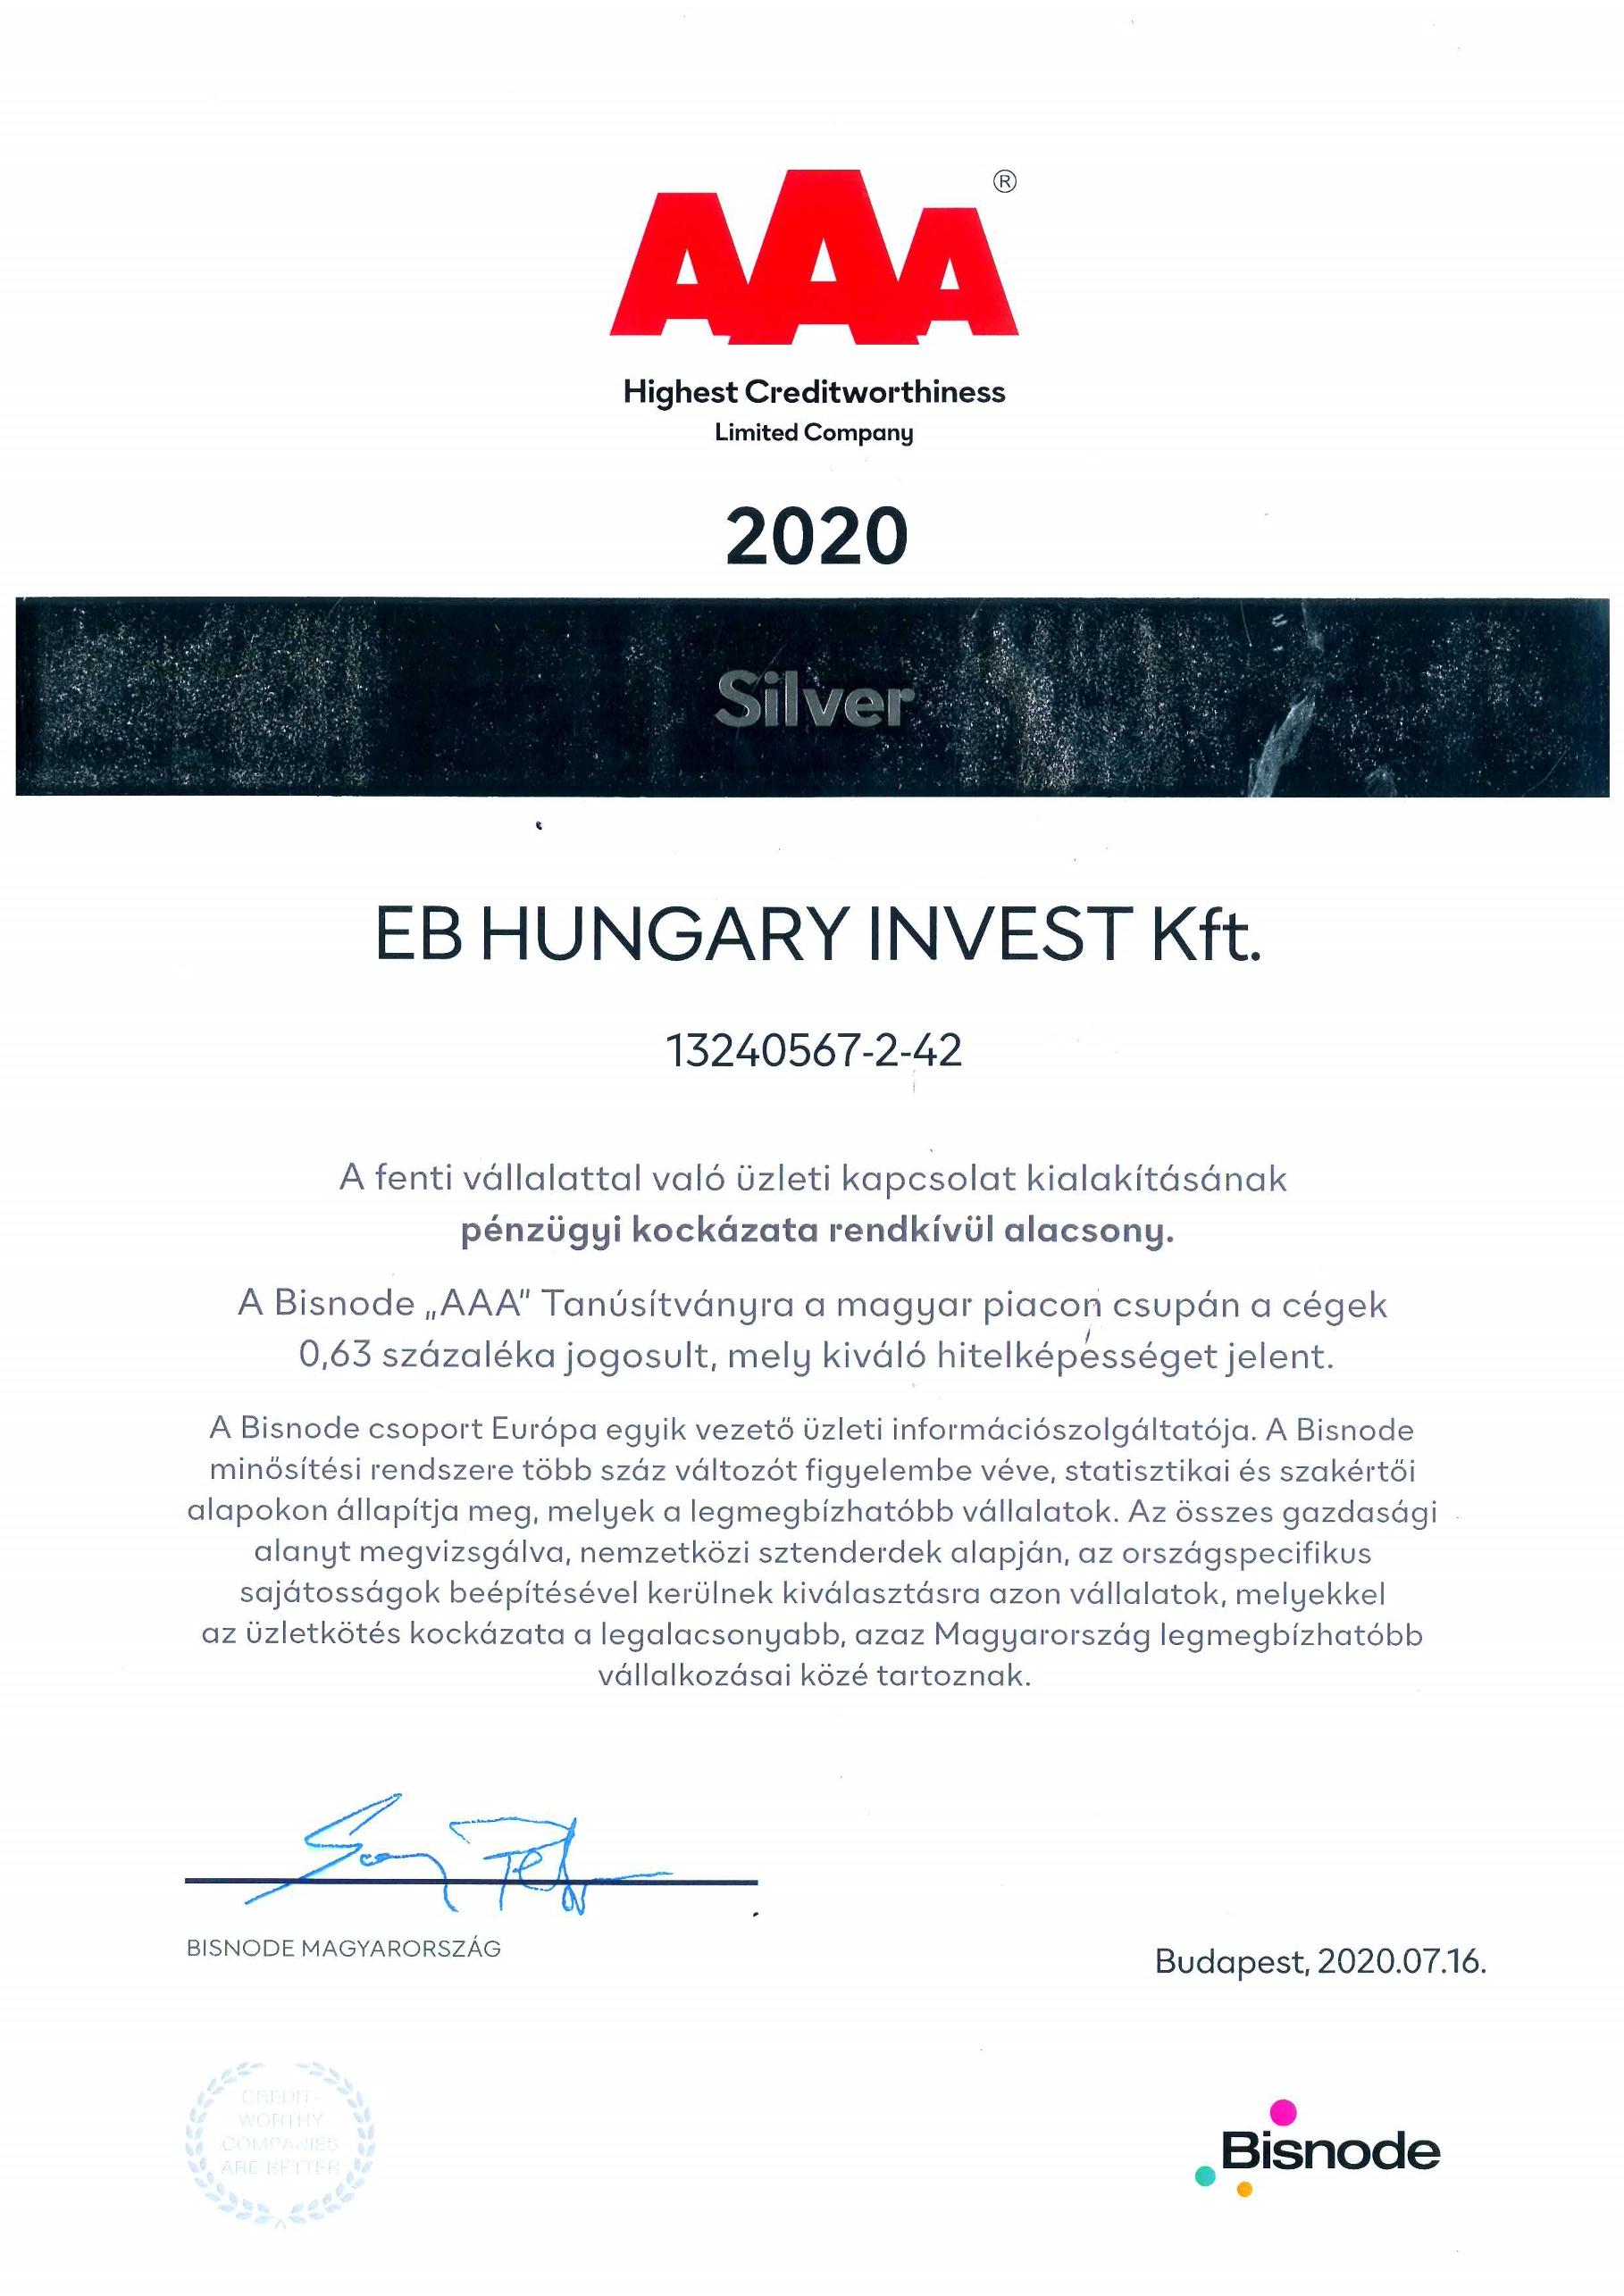 "Bisnode Tanúsítvány ""AAA"" Oklevél-EB HUNGARY INVEST Kft. 2020."